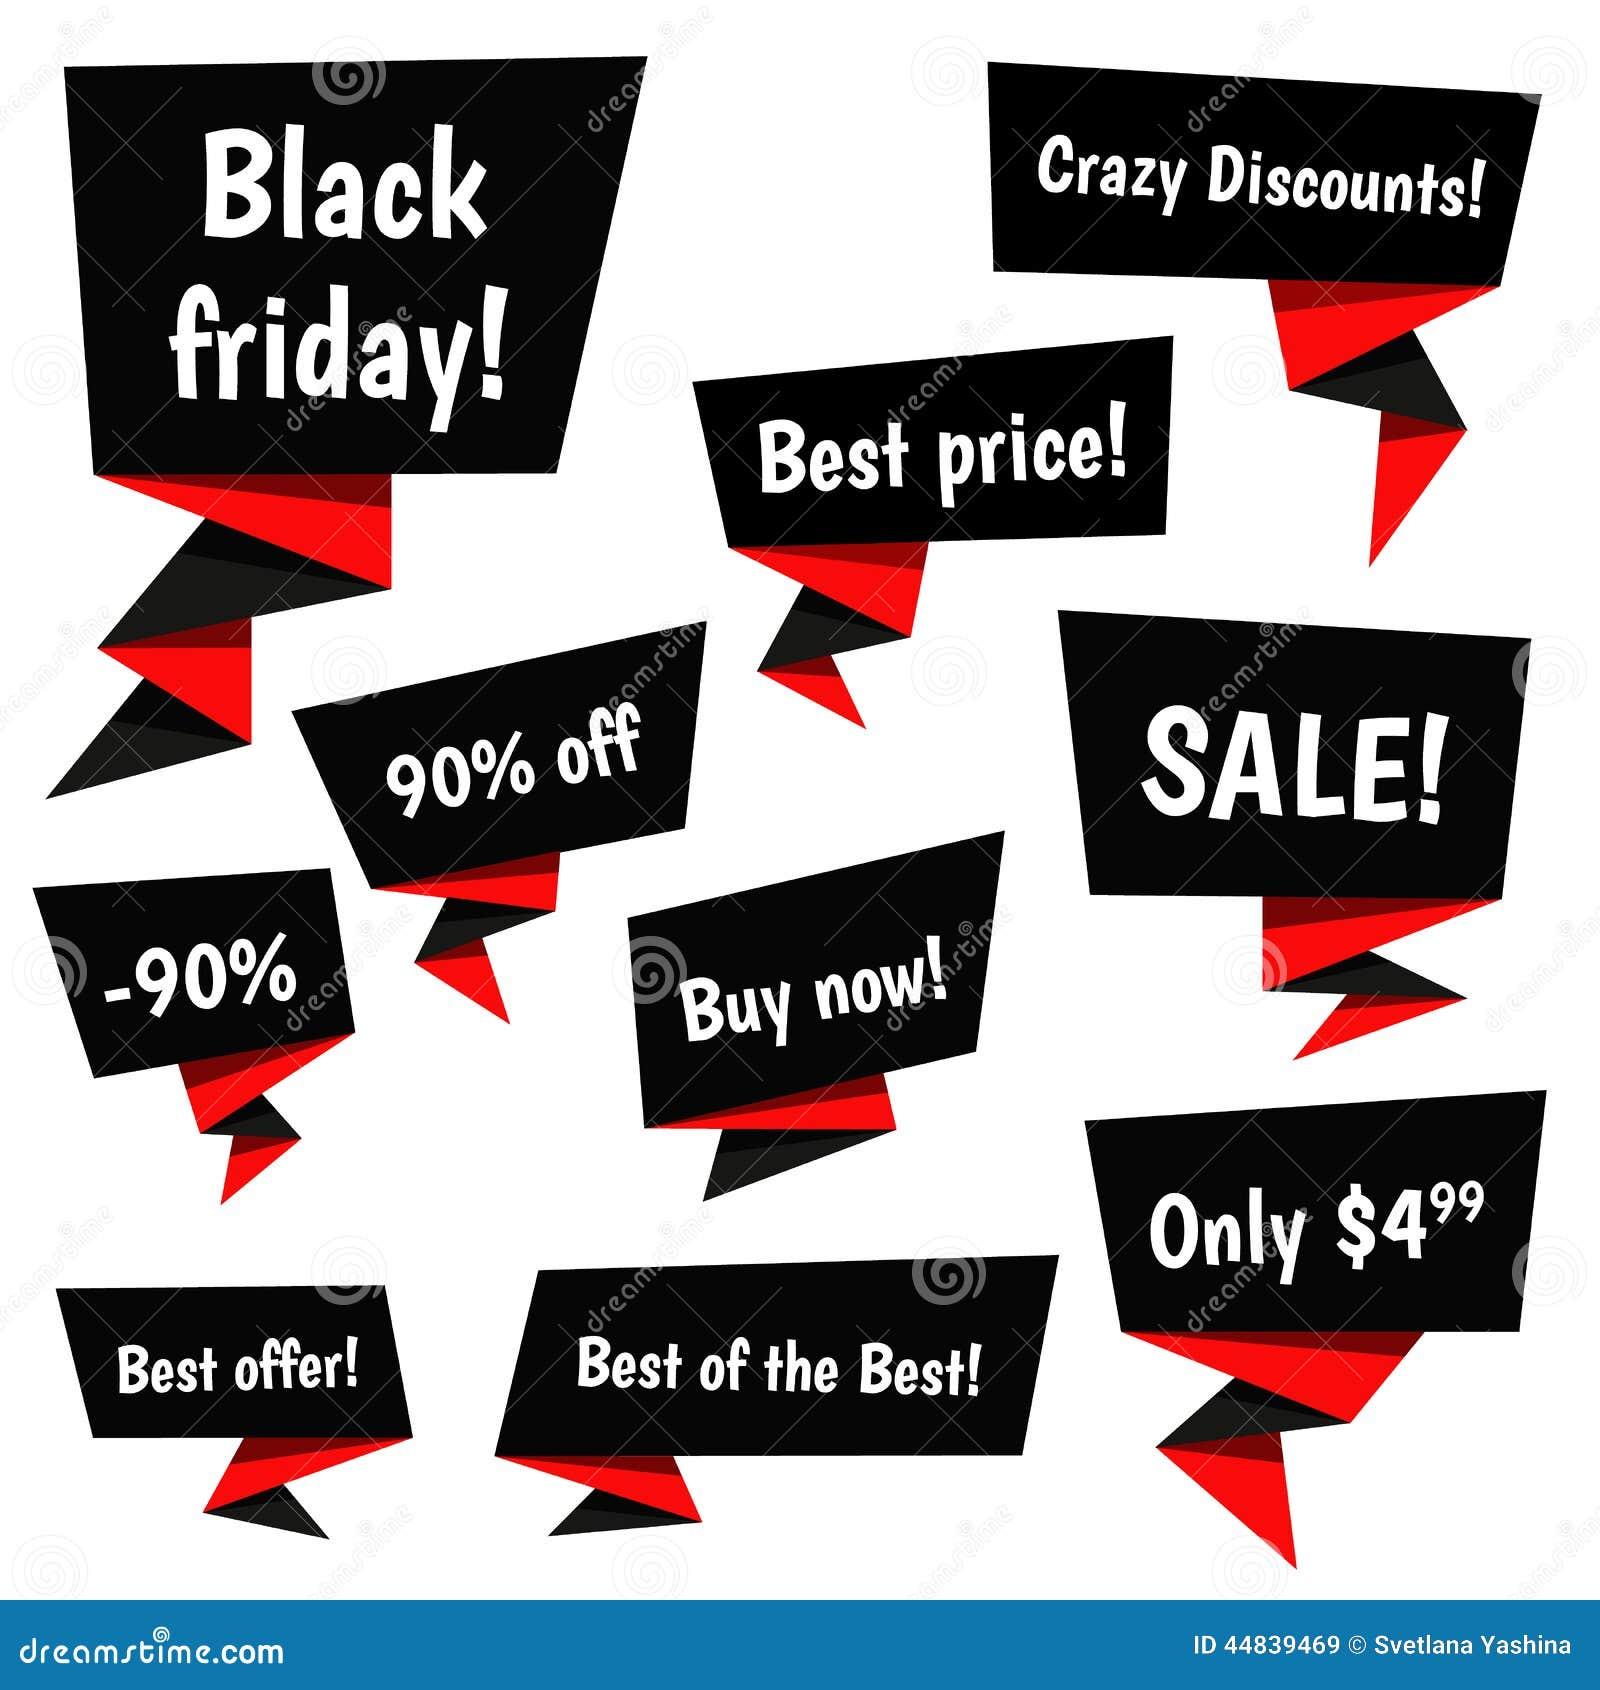 sales promotion template – Sales Promotion Template